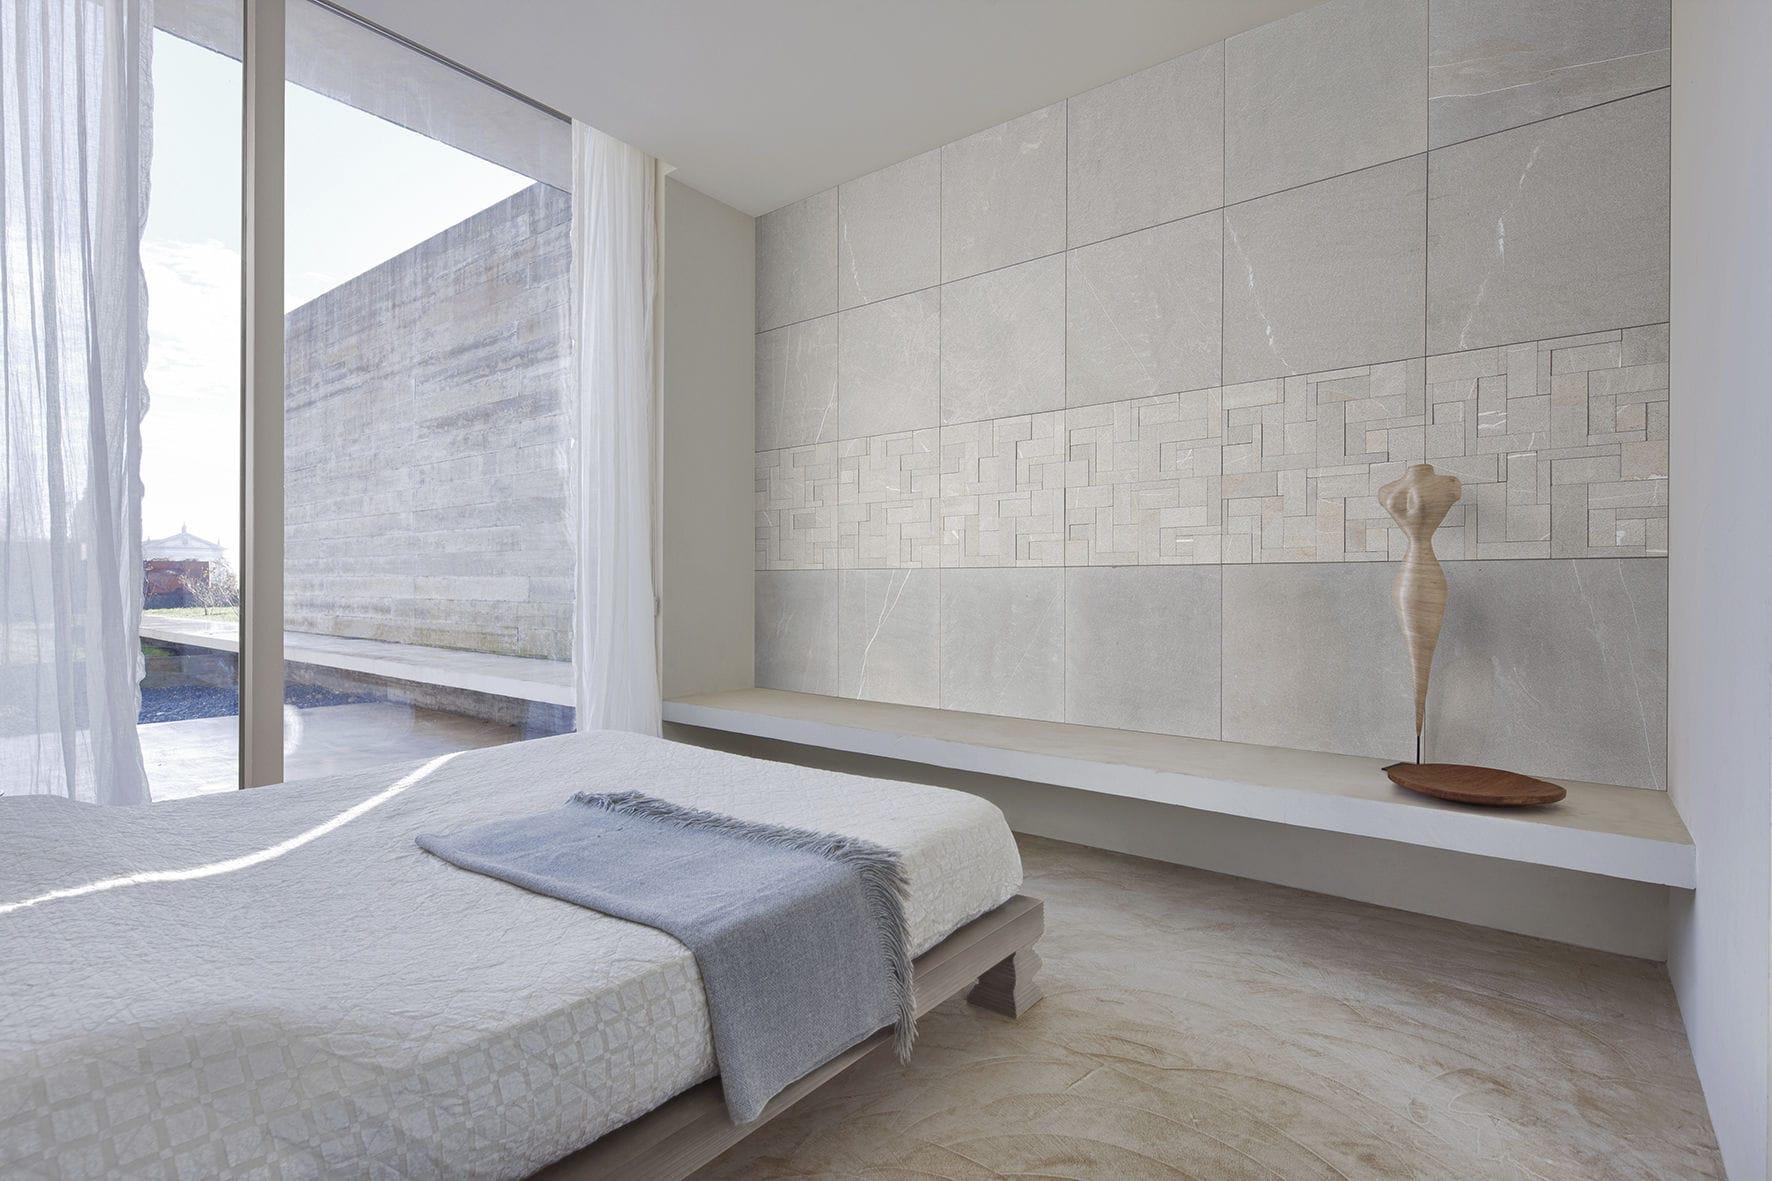 Emejing Piastrelle Per Camera Da Letto Images - House Design Ideas ...